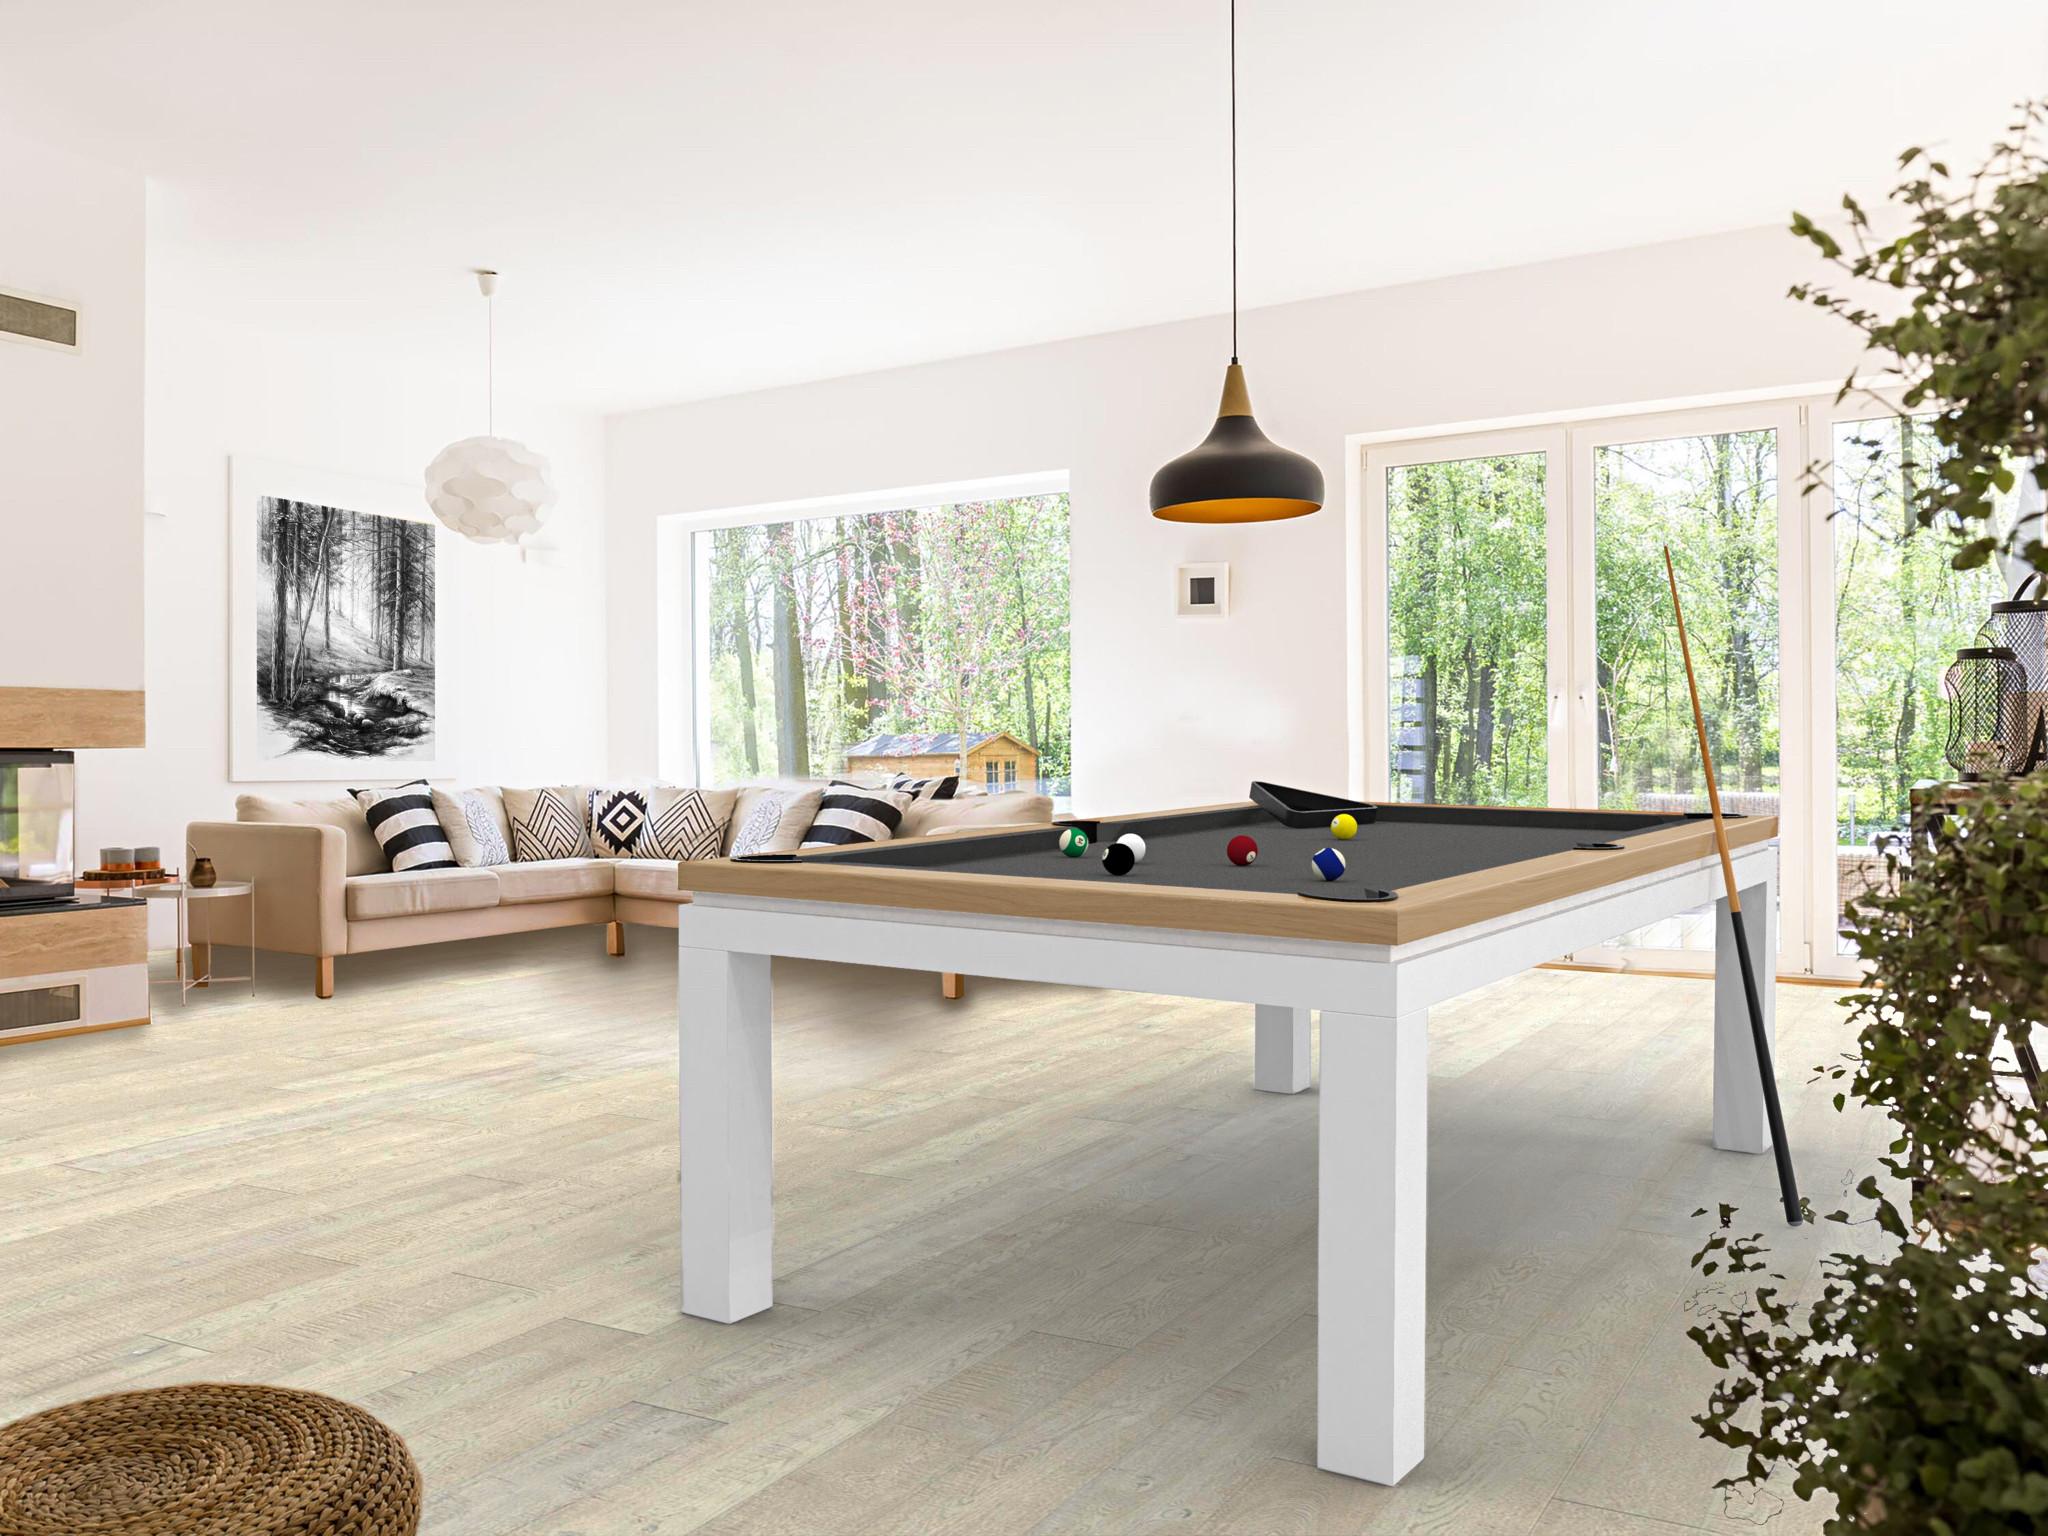 Billard NEW TENDANCE Table Bicolore chêne pieds blanc tapis gris ardoise